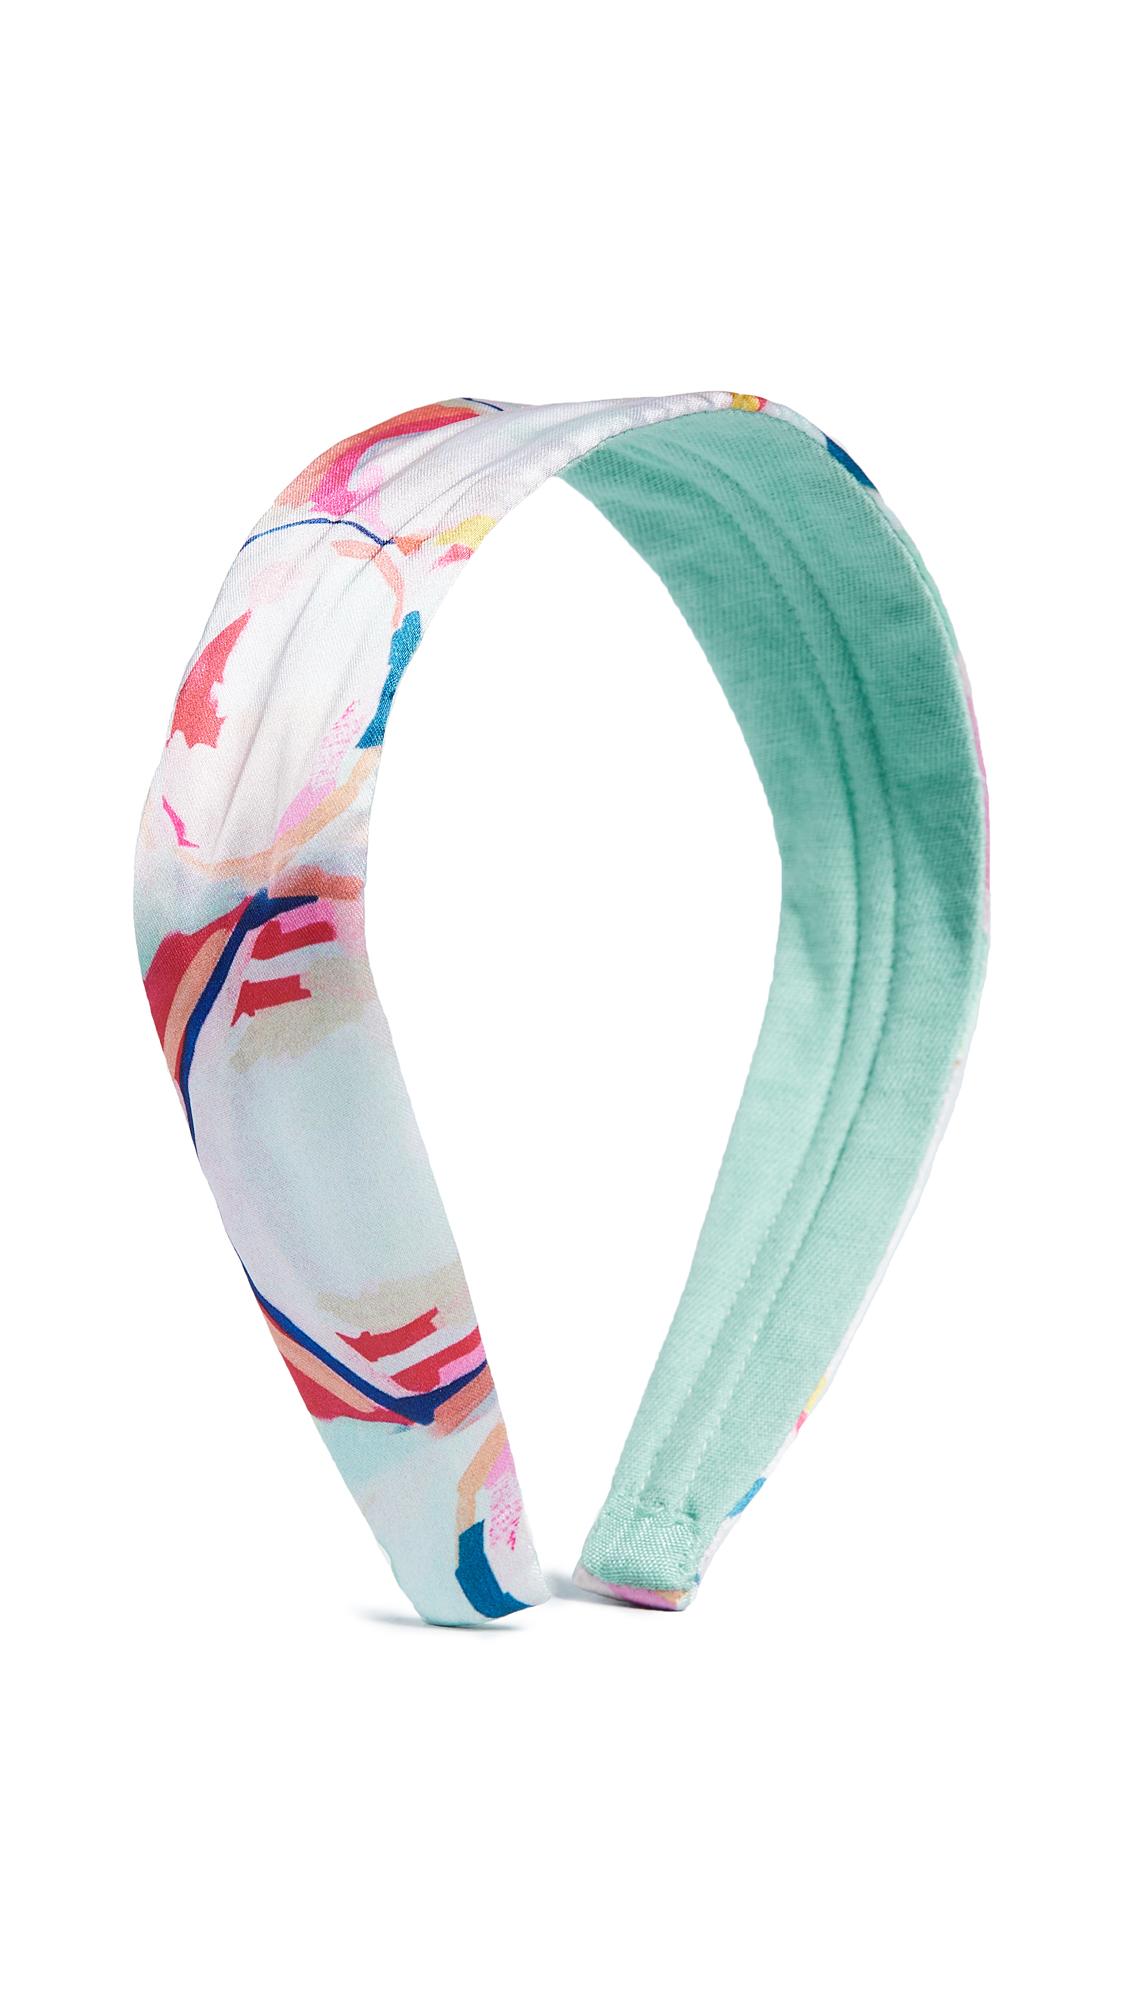 NAMJOSH Pastel Floral Print Headband - Multi